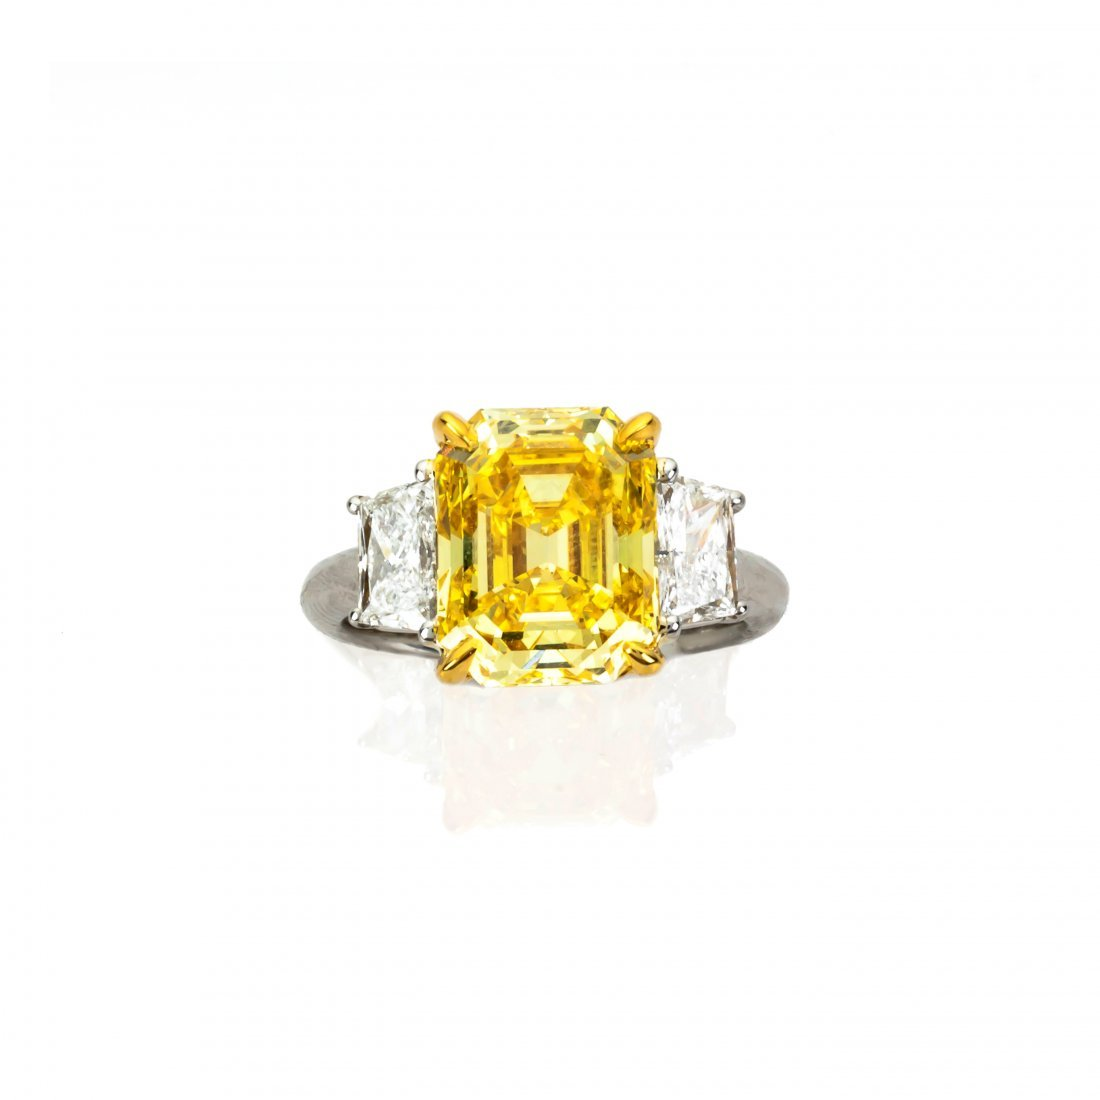 5 Carat Fancy Vivid Yellow Diamond & Diamond Ring